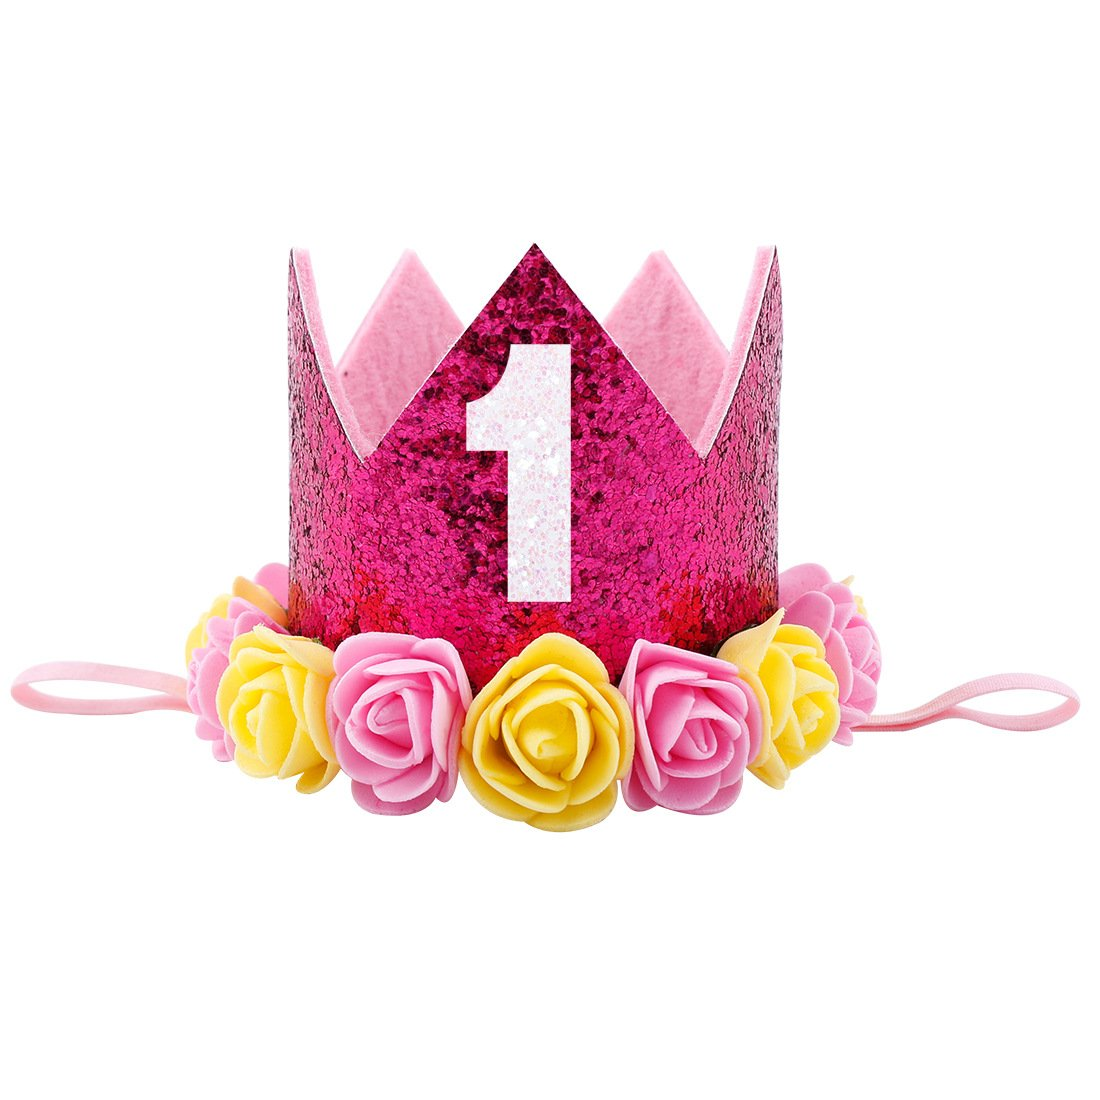 Missley Baby Crown Headband Rose Flower Princess Crown Cumpleaños Crown Head Accesorios para el cabello QQ-Crown-WhiteFlower-1